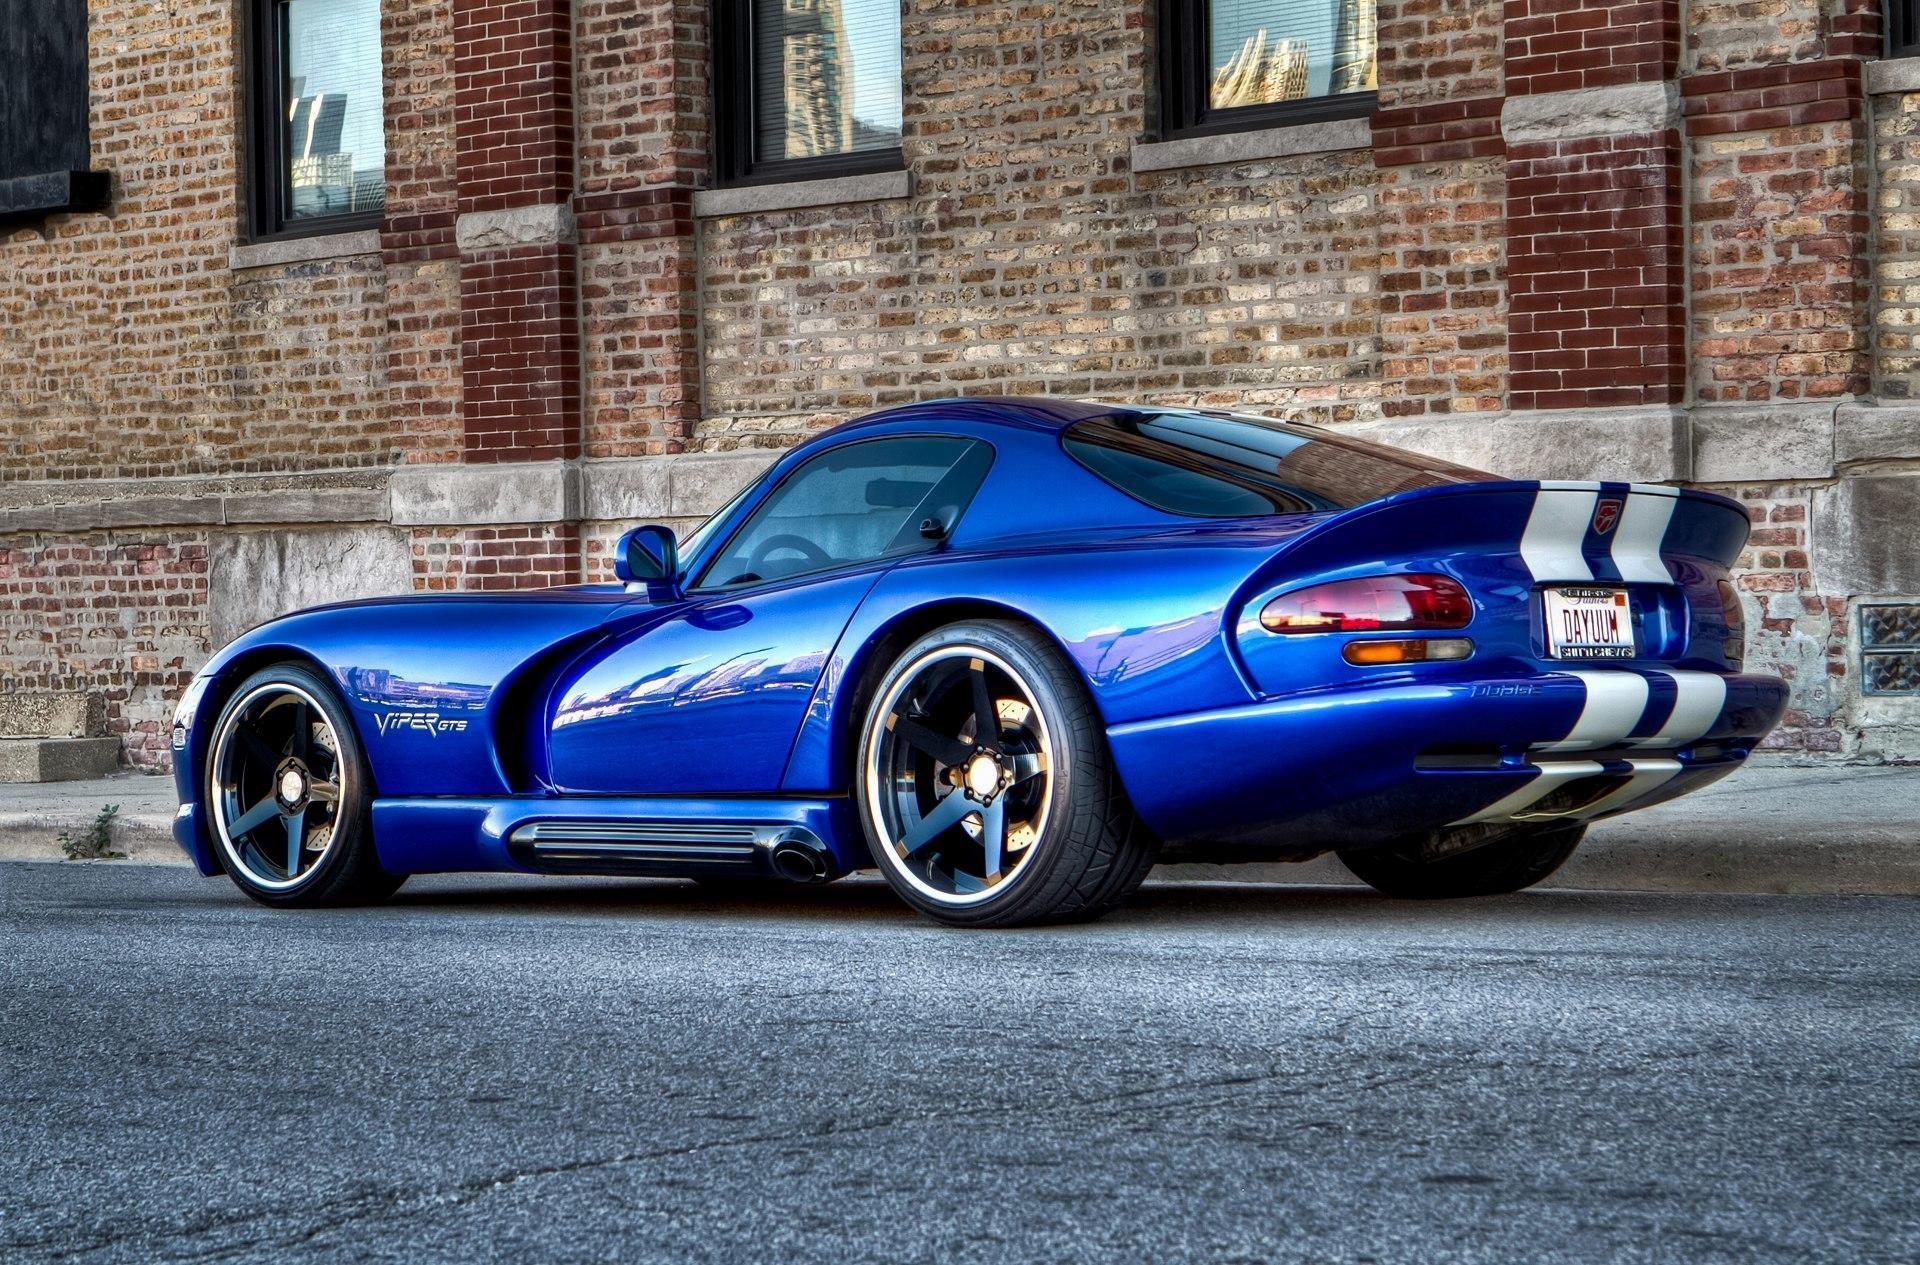 2560x1440 2017 Dodge Viper Final Edition 2